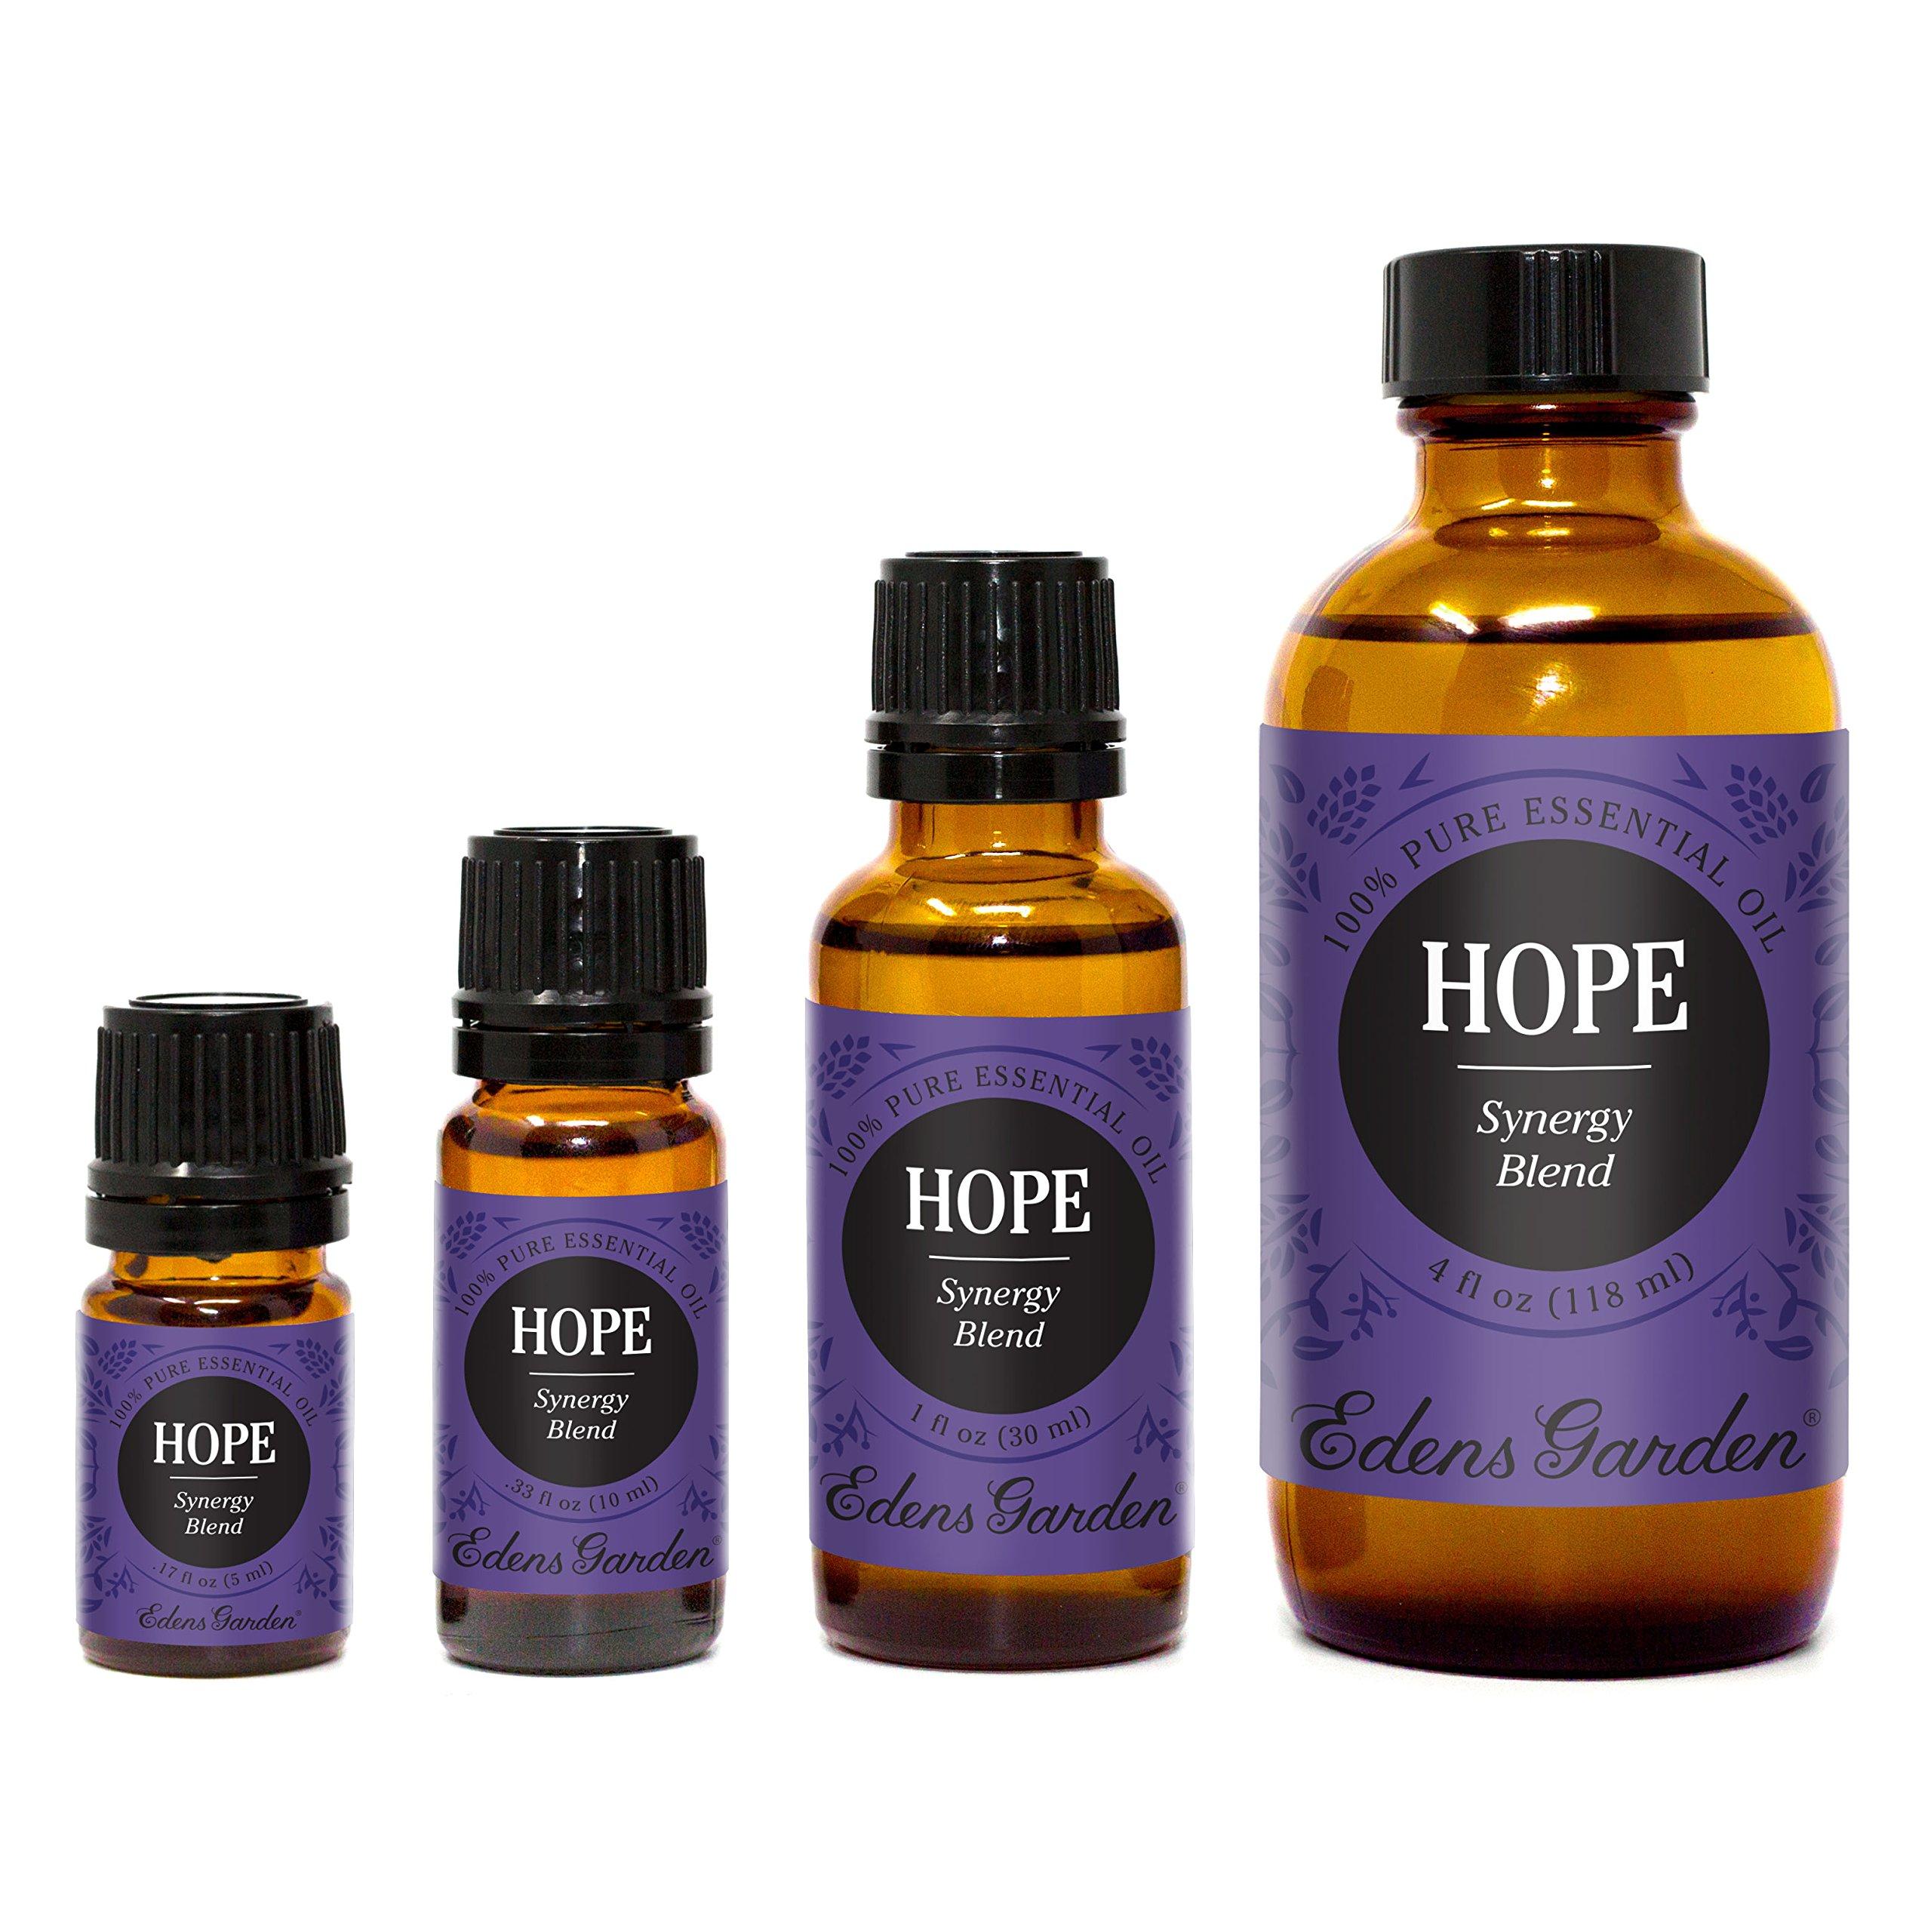 Edens Garden Hope 30 ml 100% Pure Therapeutic Grade GC/MS Tested (Spanish Rosemary, Tangerine, Lemongrass, Sweet Orange, Cassia)